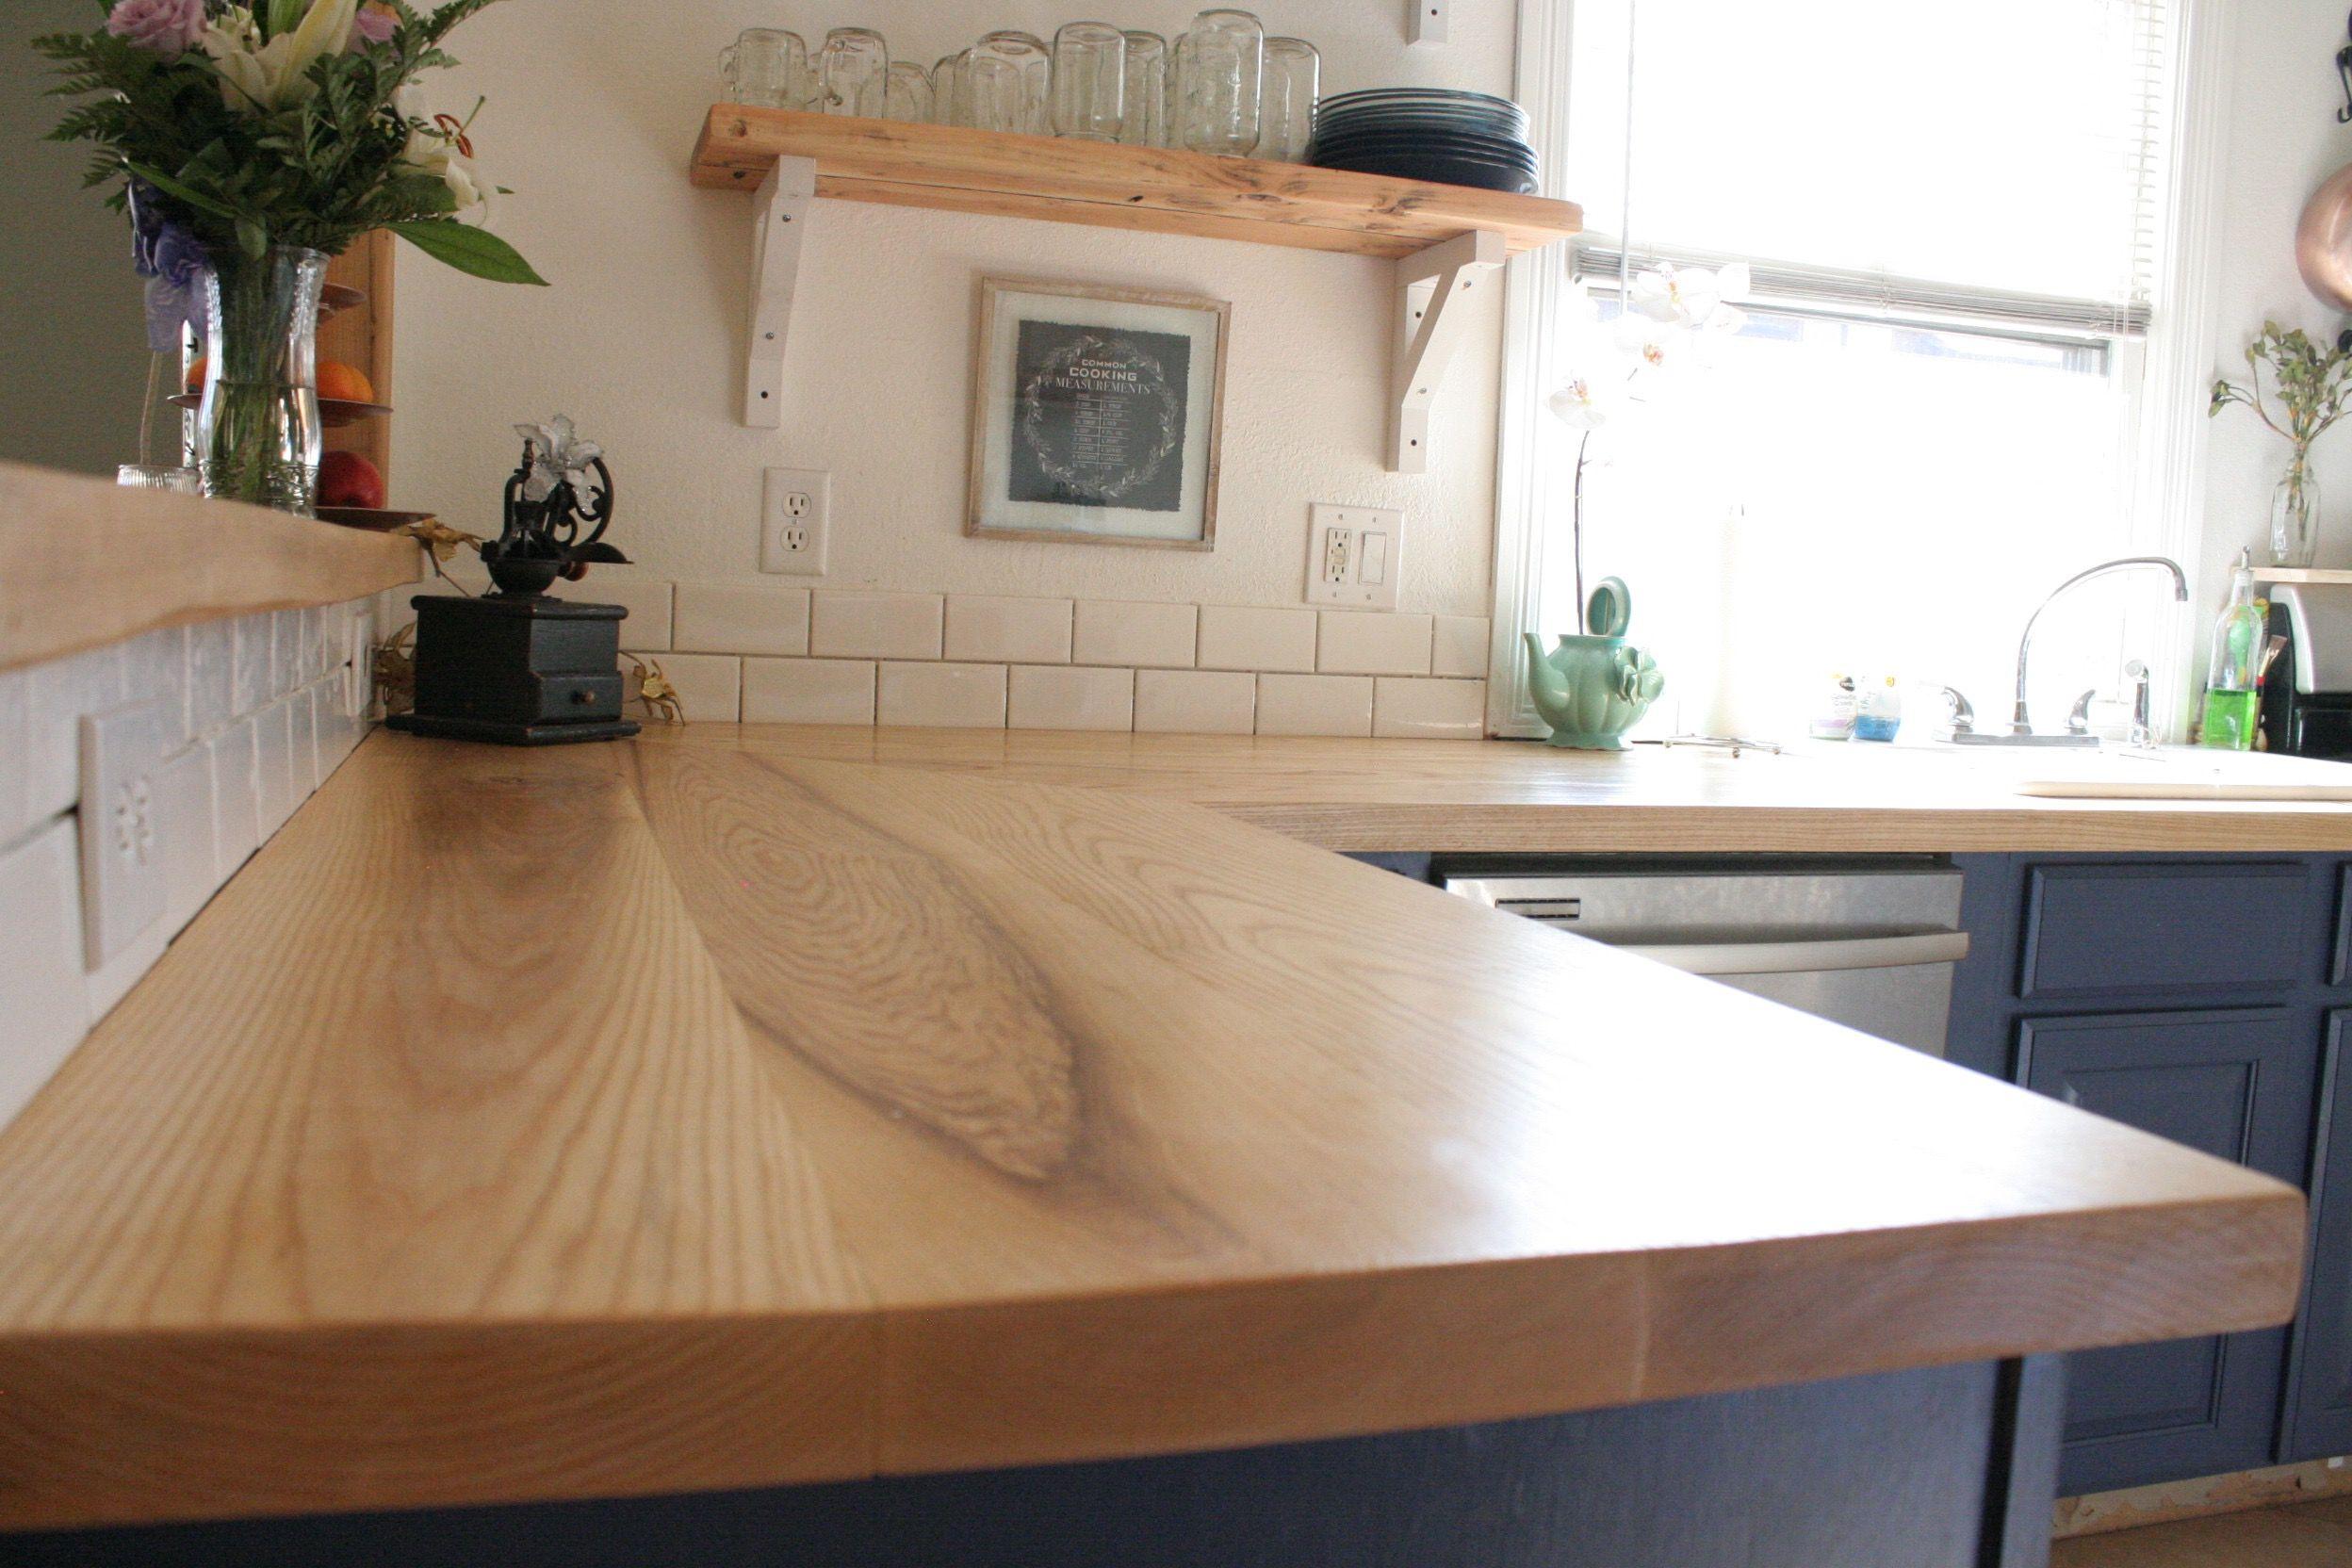 Incredible Wood Countertops Using Ash Hardwood Mg Table Co Mgtables Short Links Chair Design For Home Short Linksinfo